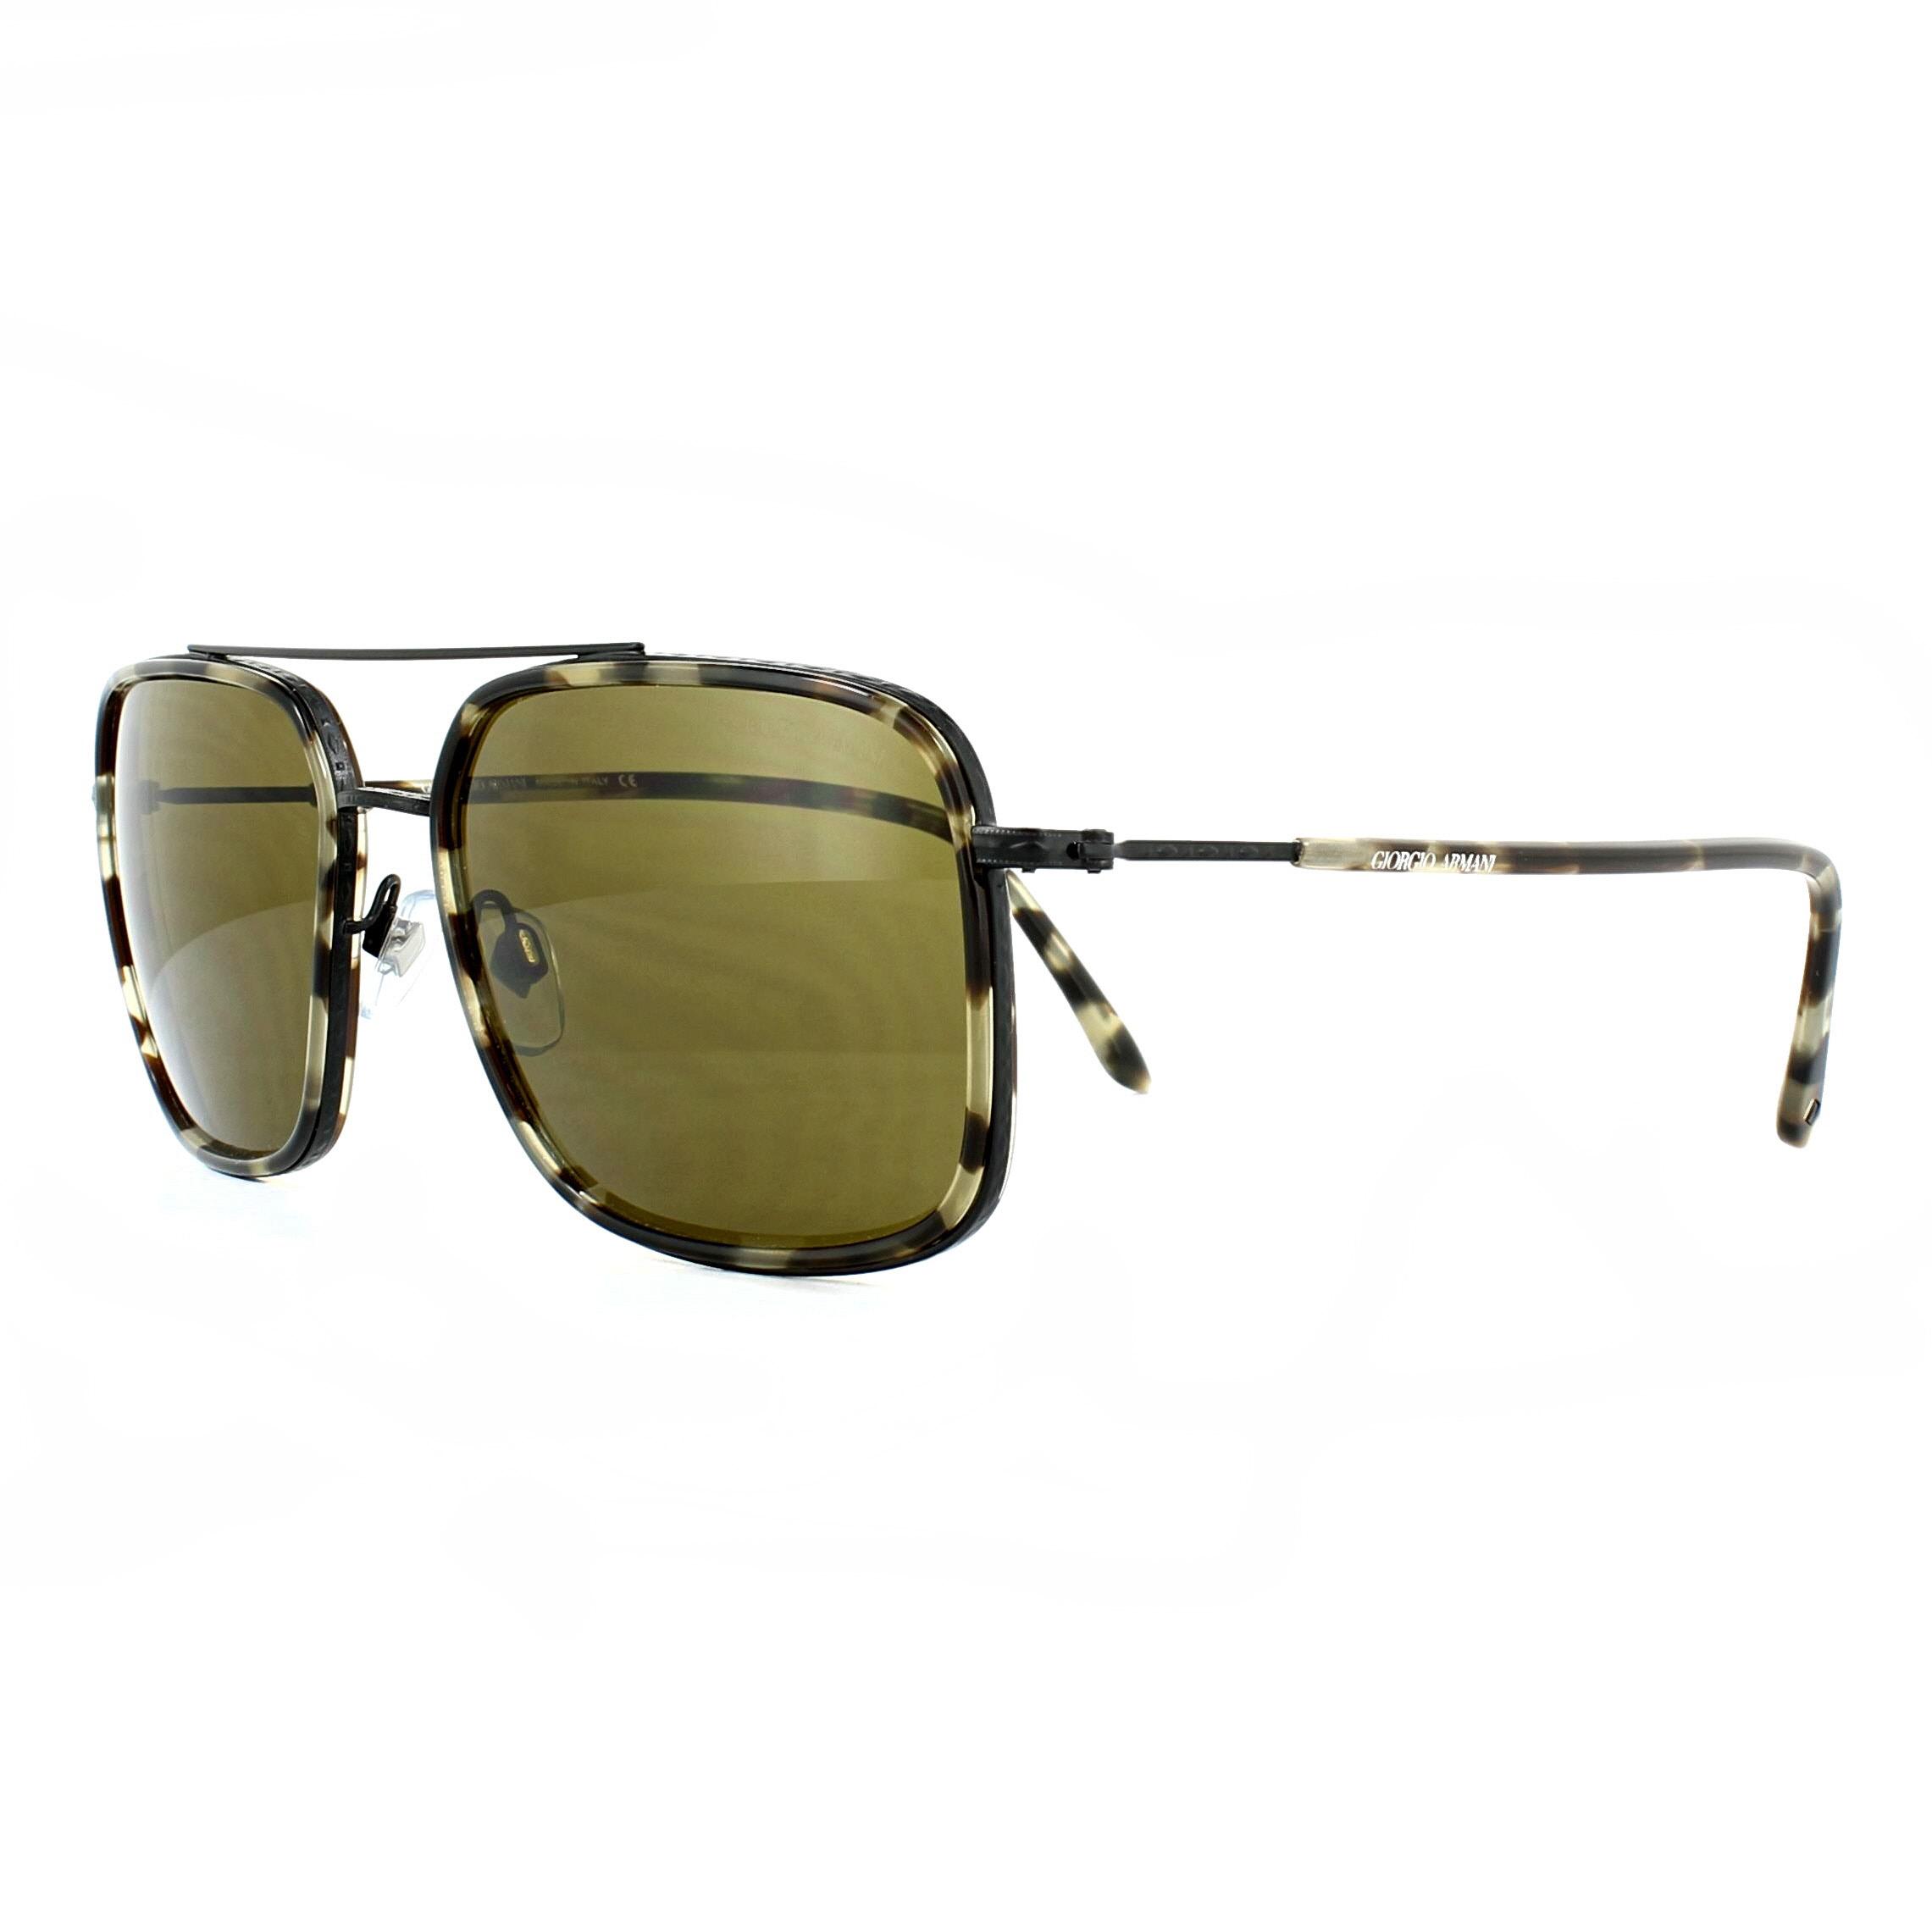 80191aa55b8b Giorgio Armani Sunglasses AR6031 311973 Havana Brown 8053672466829 ...